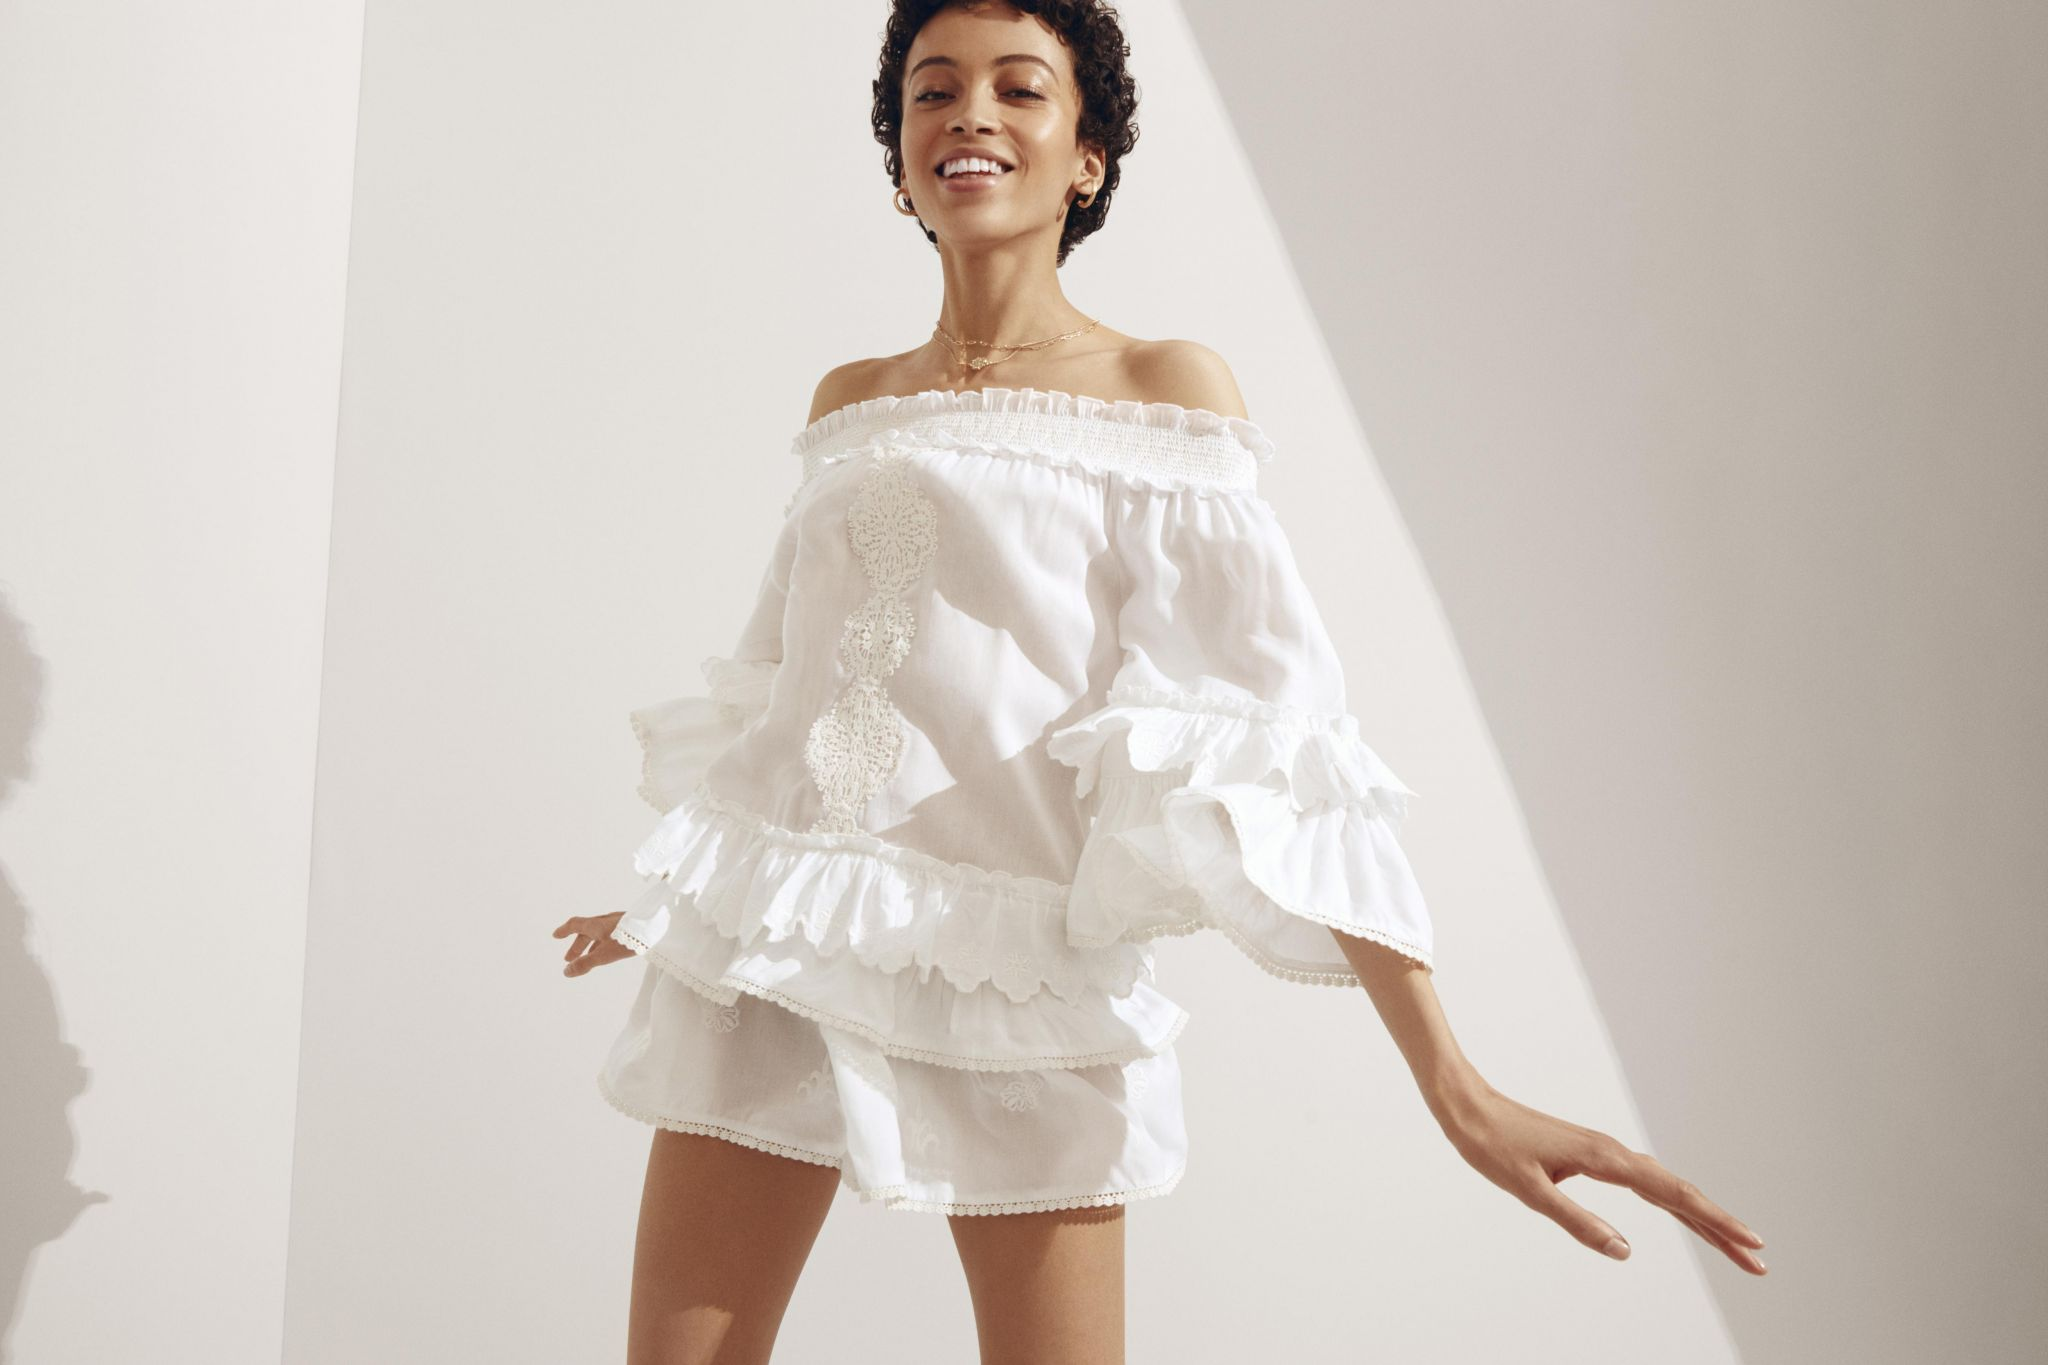 River Island model in white dress